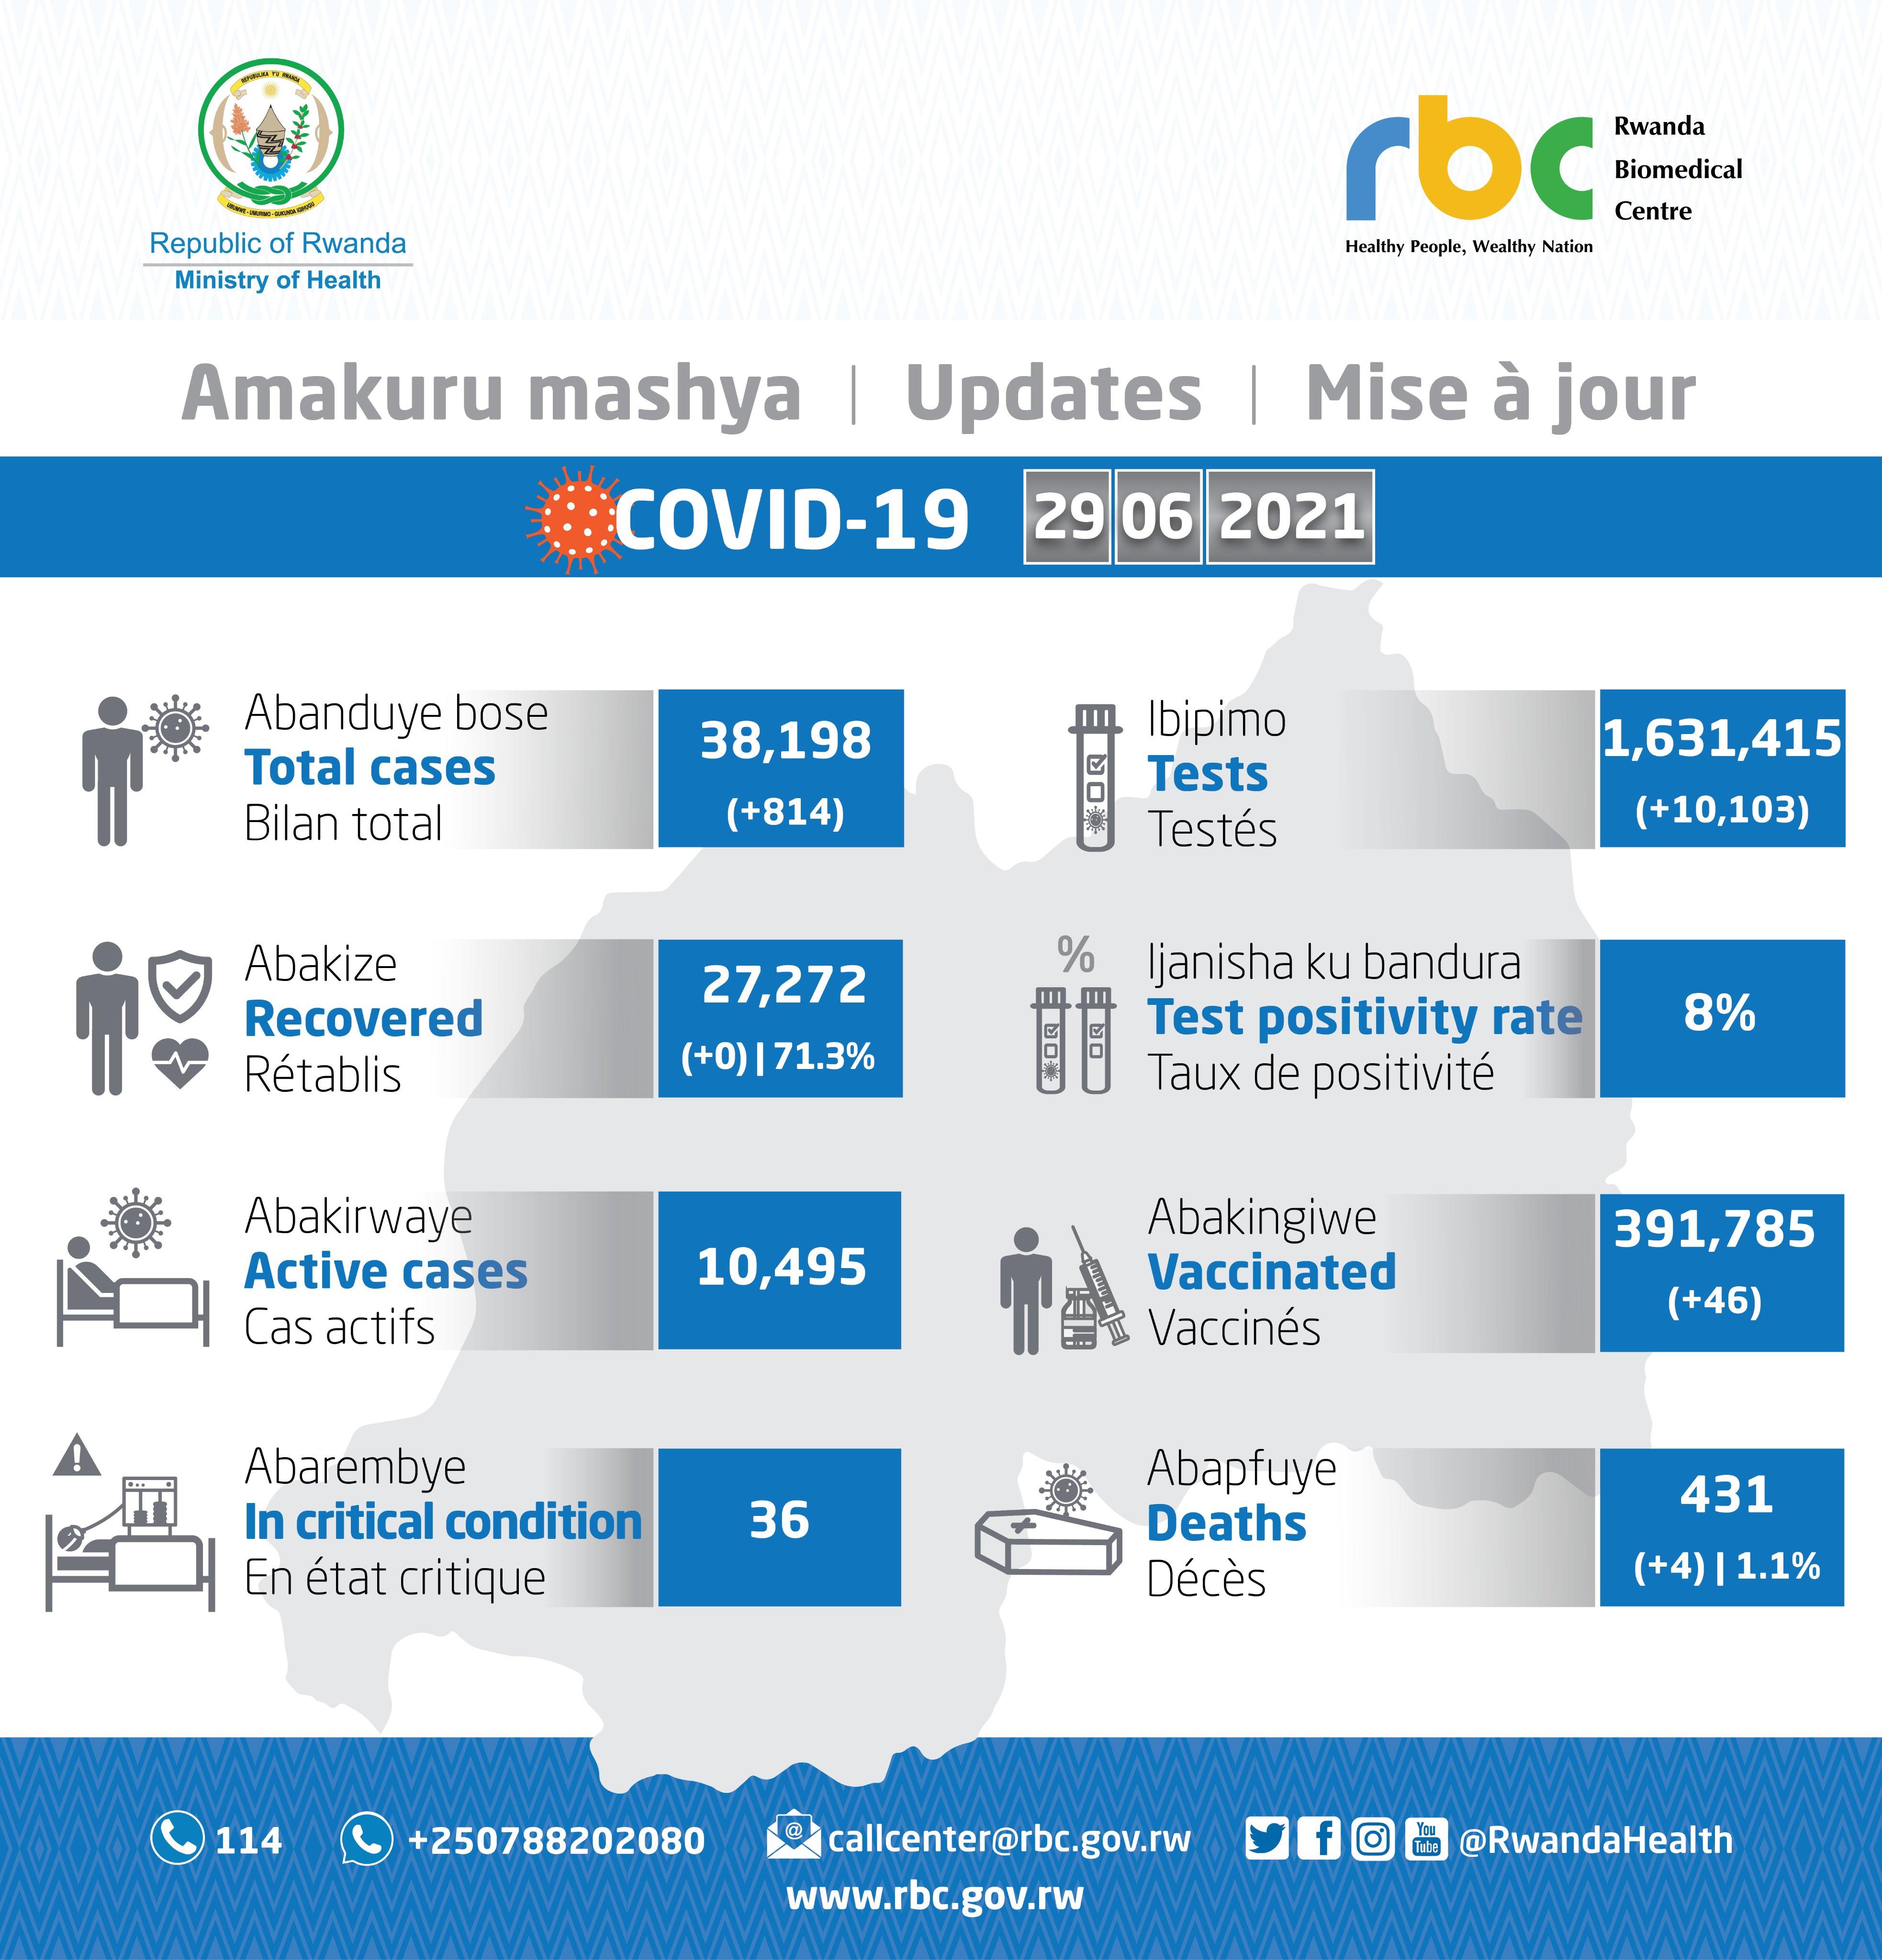 Ministry of Health, Republic of Rwanda